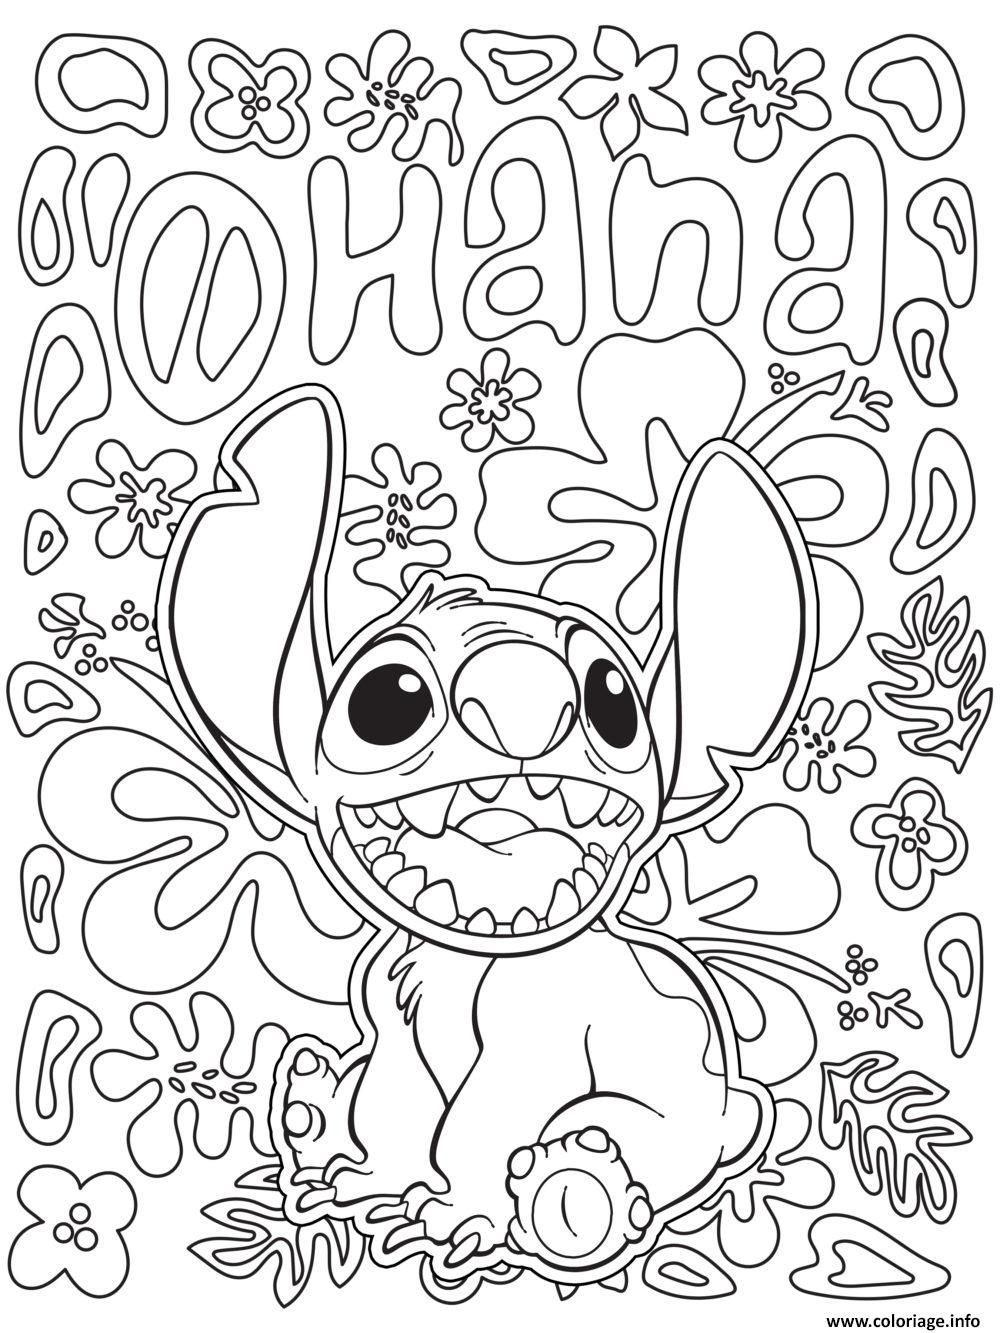 Cahier De Coloriage Mandala Disney In 2020 Stitch Coloring Pages Free Disney Coloring Pages Disney Coloring Sheets